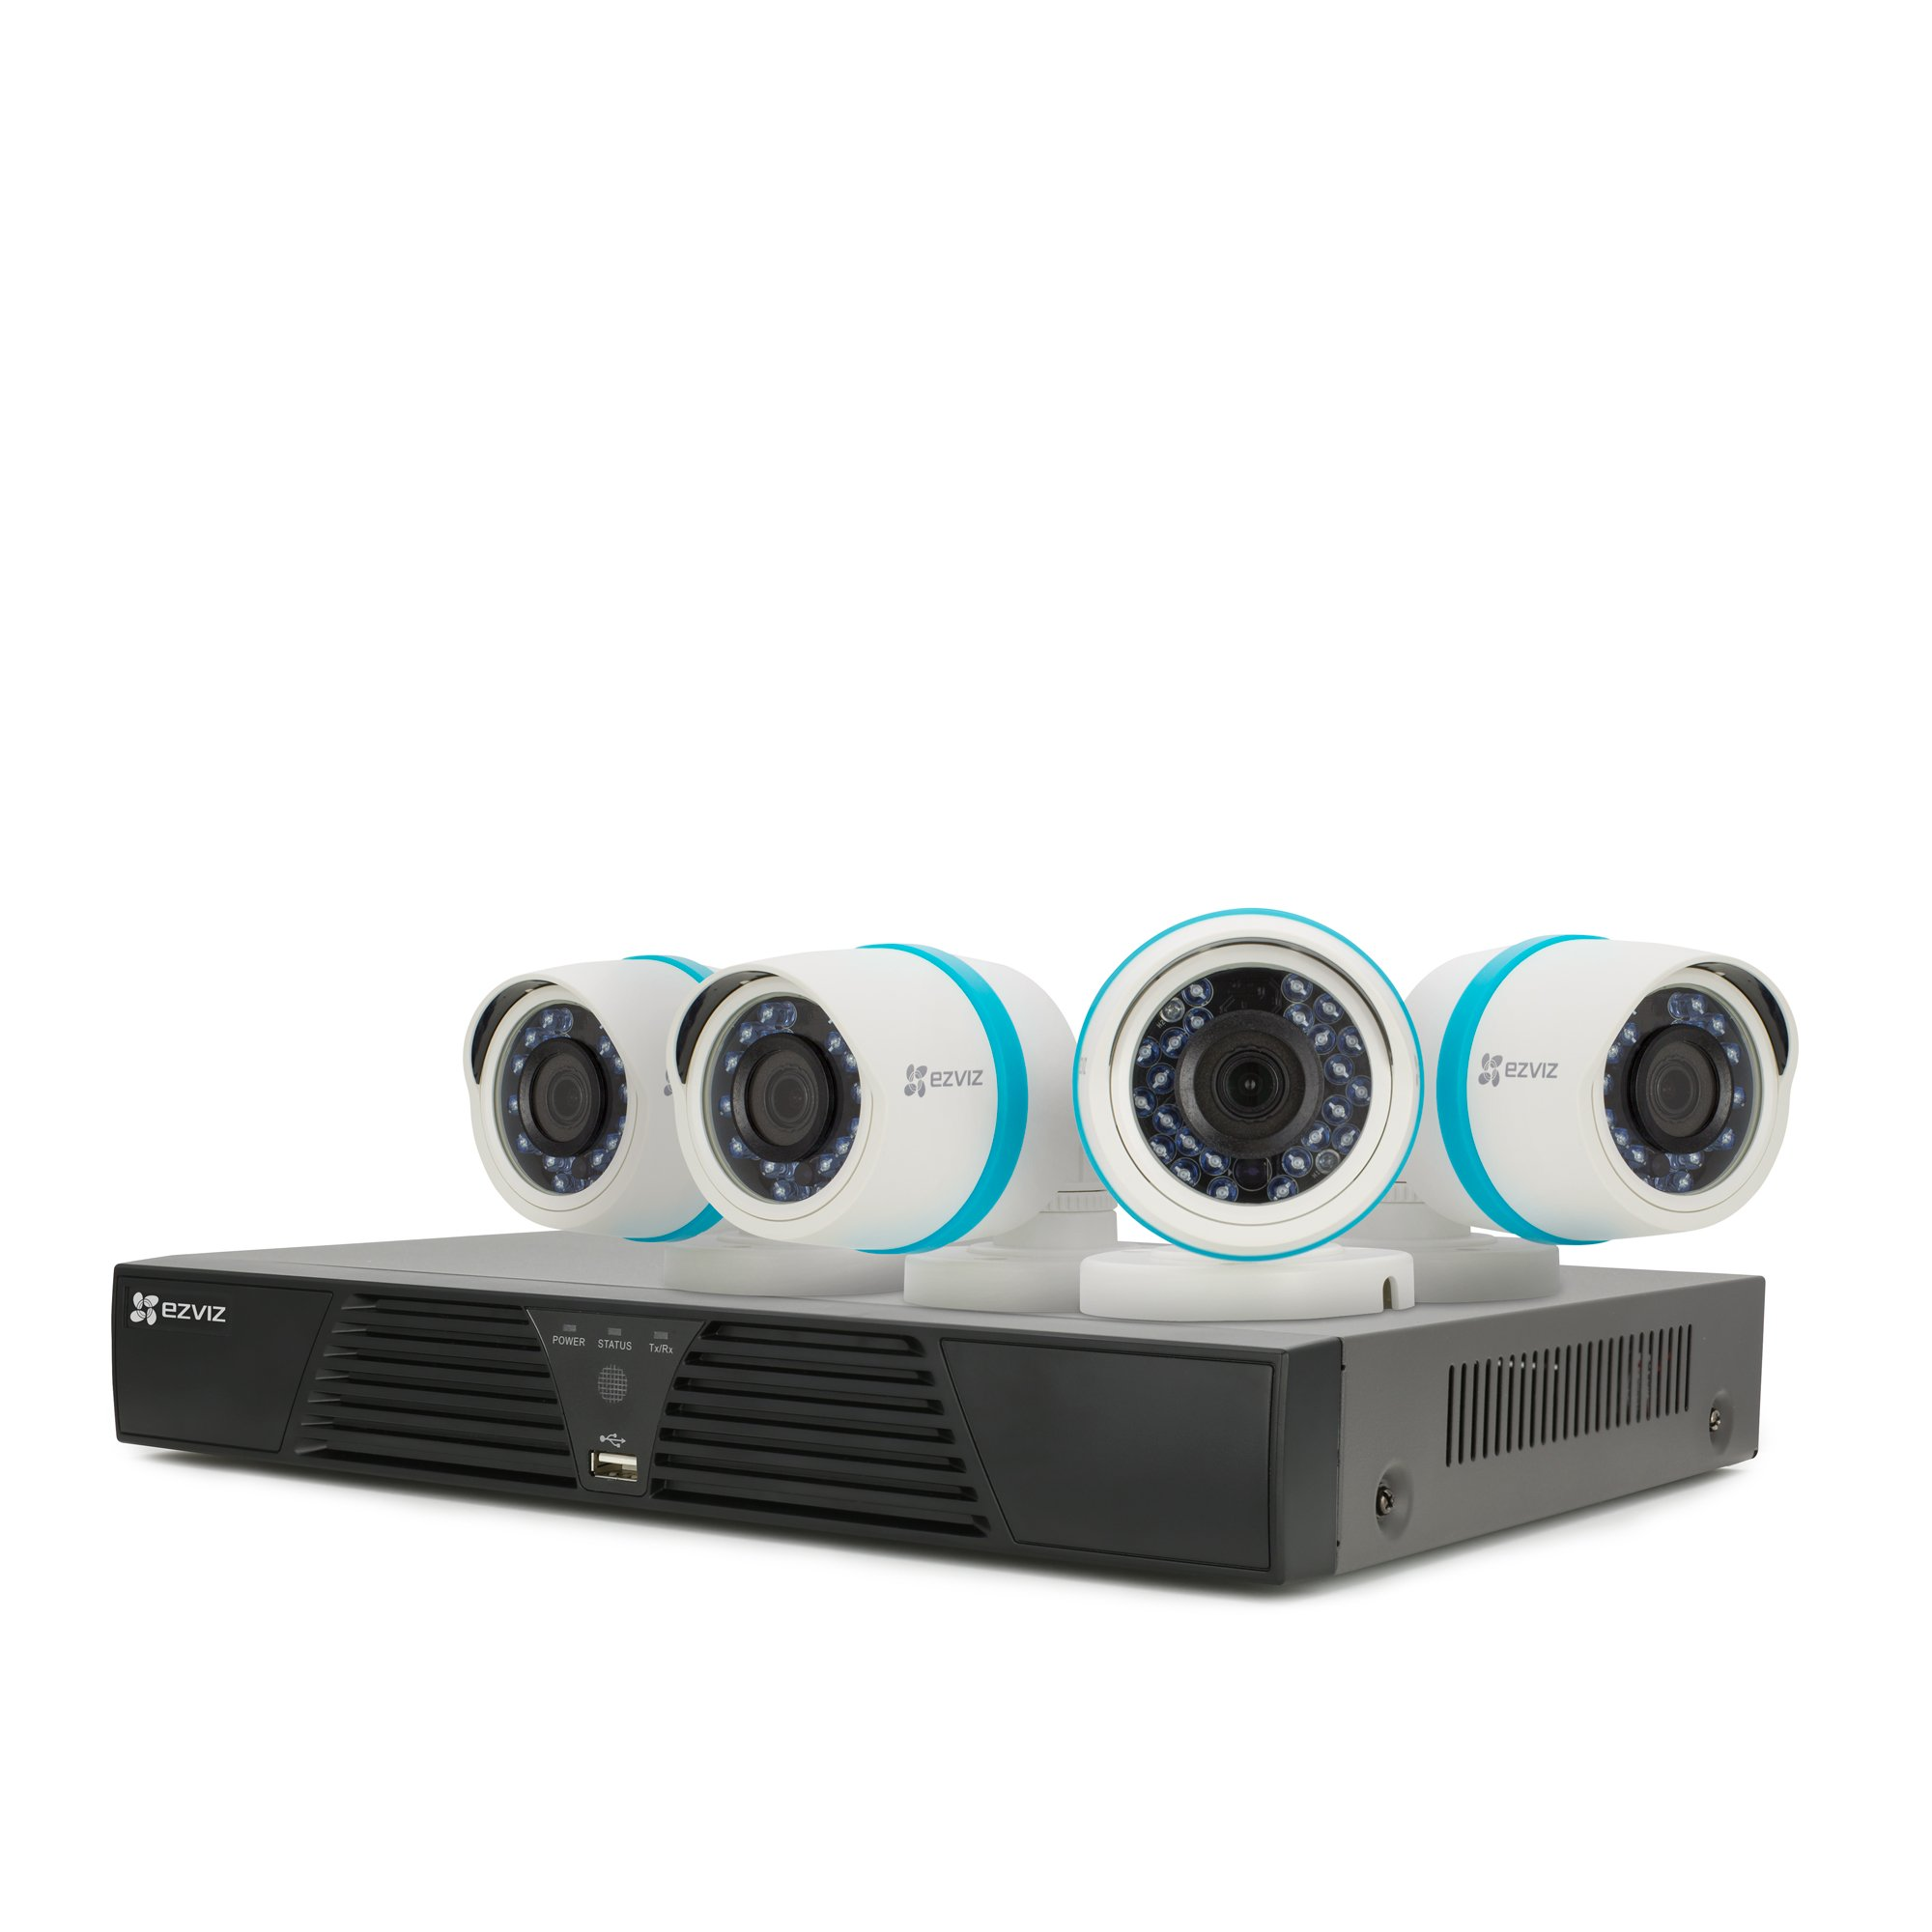 EZVIZ FULL HD 1080p Outdoor IP PoE Surveillance System, 4 Weatherproof HD Security Cameras, 4 Channel 1TB NVR Storage, 100ft Night Vision, Customizable Motion Detection